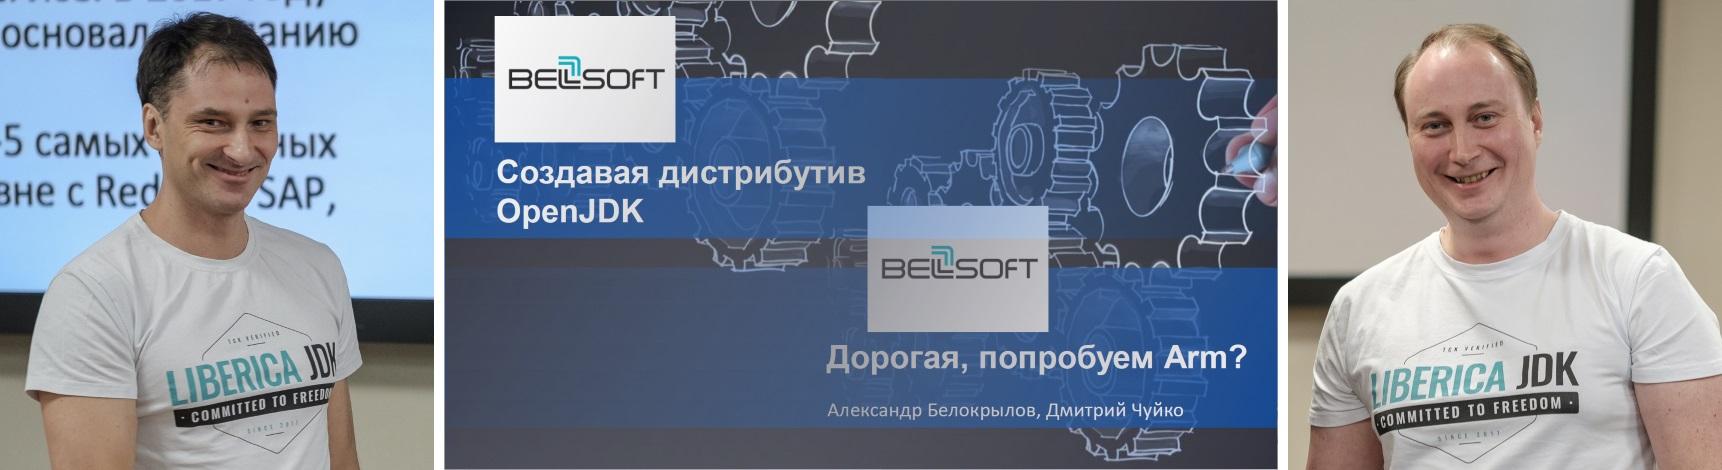 Александр Белокрылов и Дмитрий Чуйко о Liberica JDK на jug.msk.ru